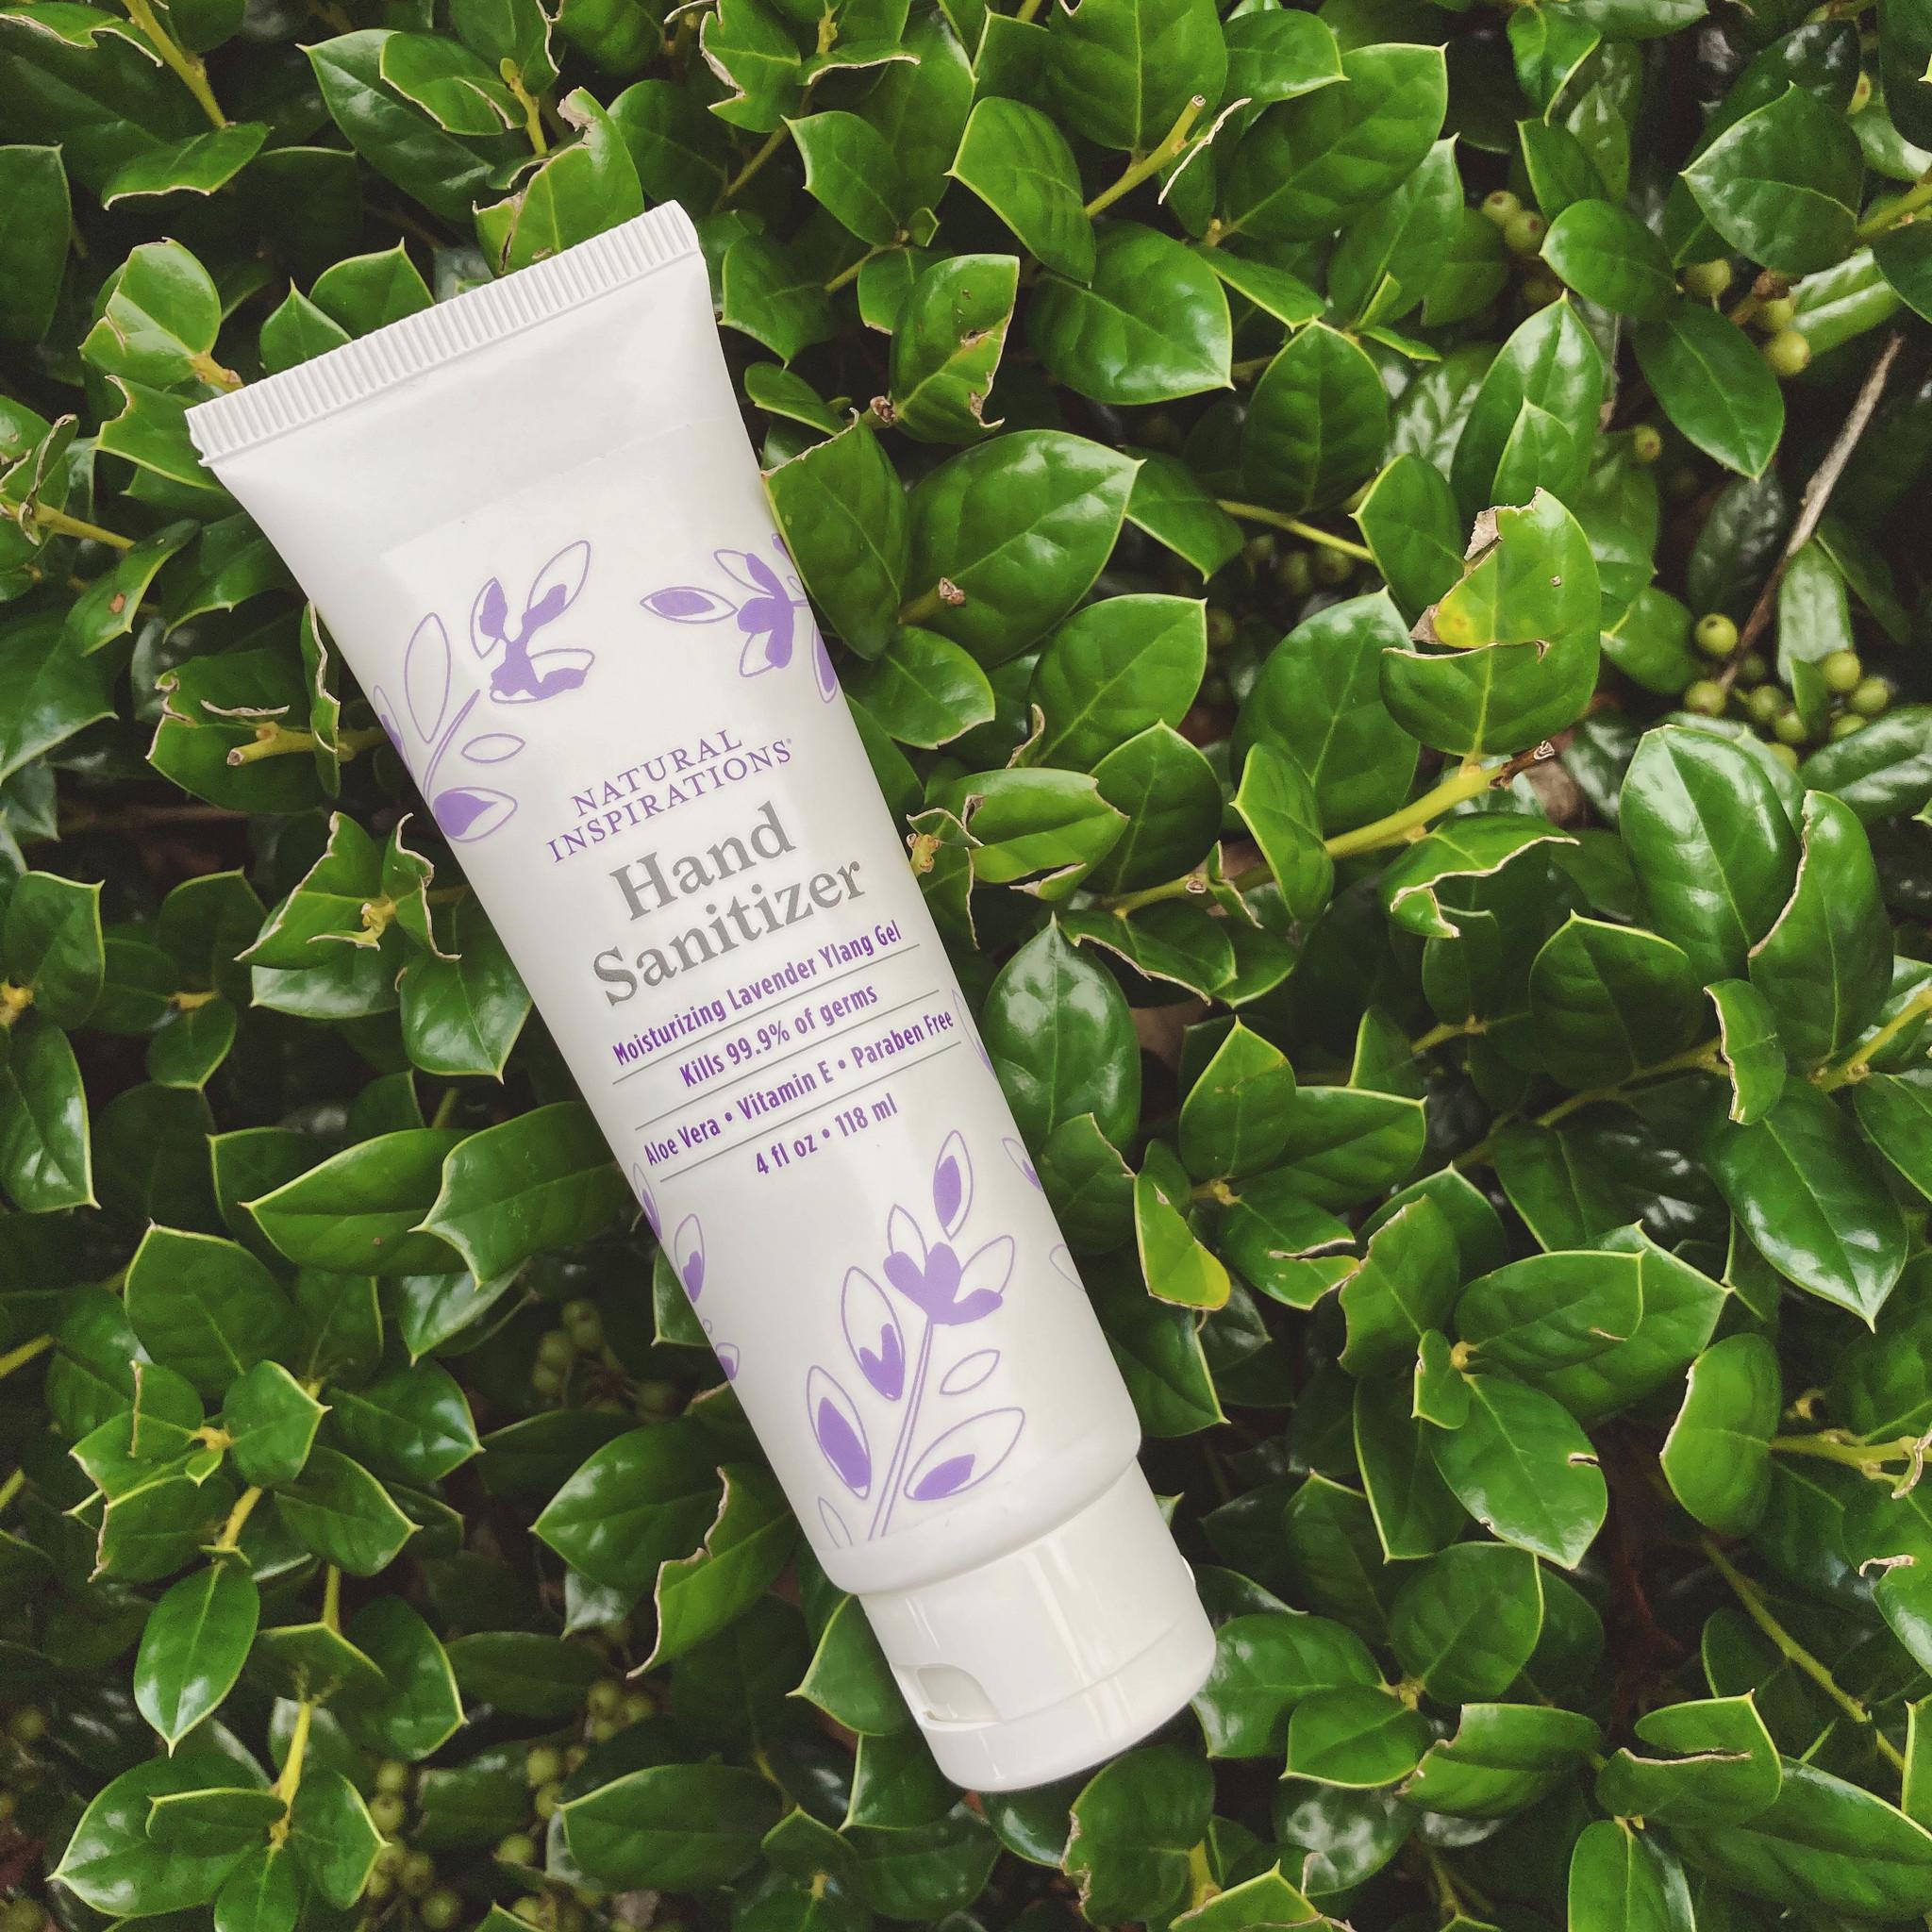 Lavender Ylang Hand Sanitizer